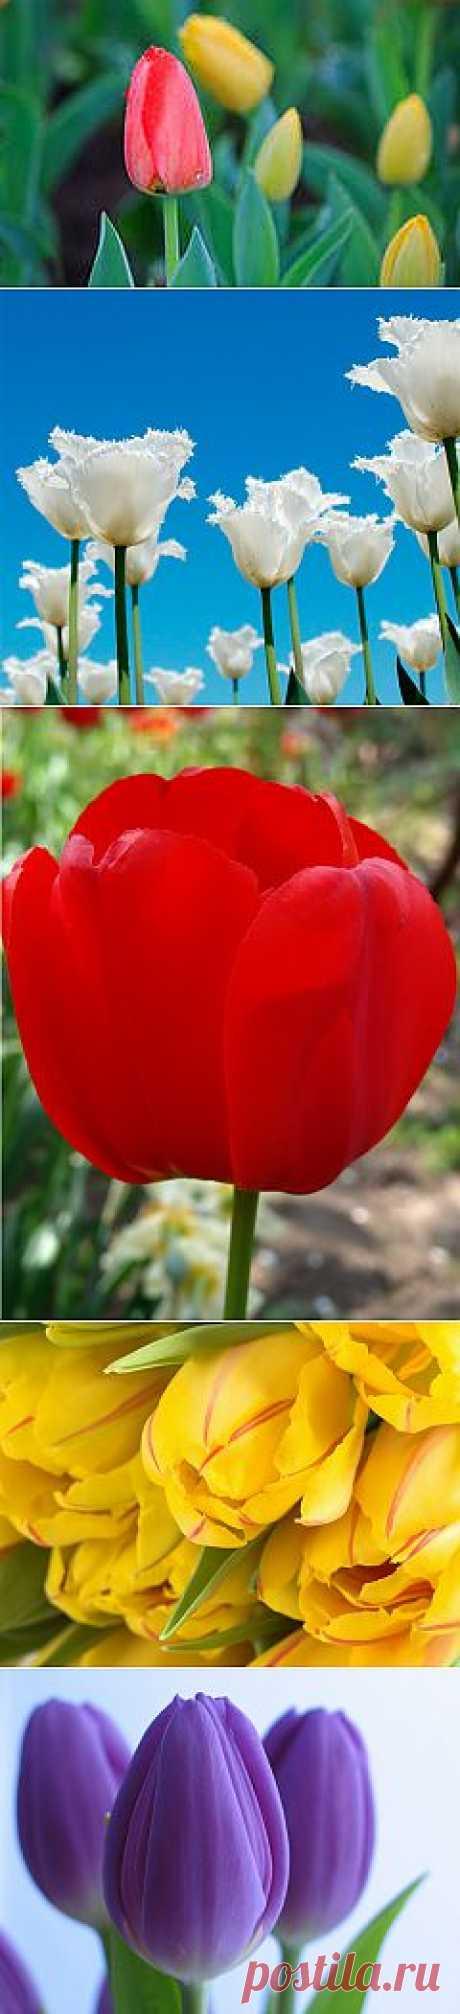 фото цветытюльпаны: